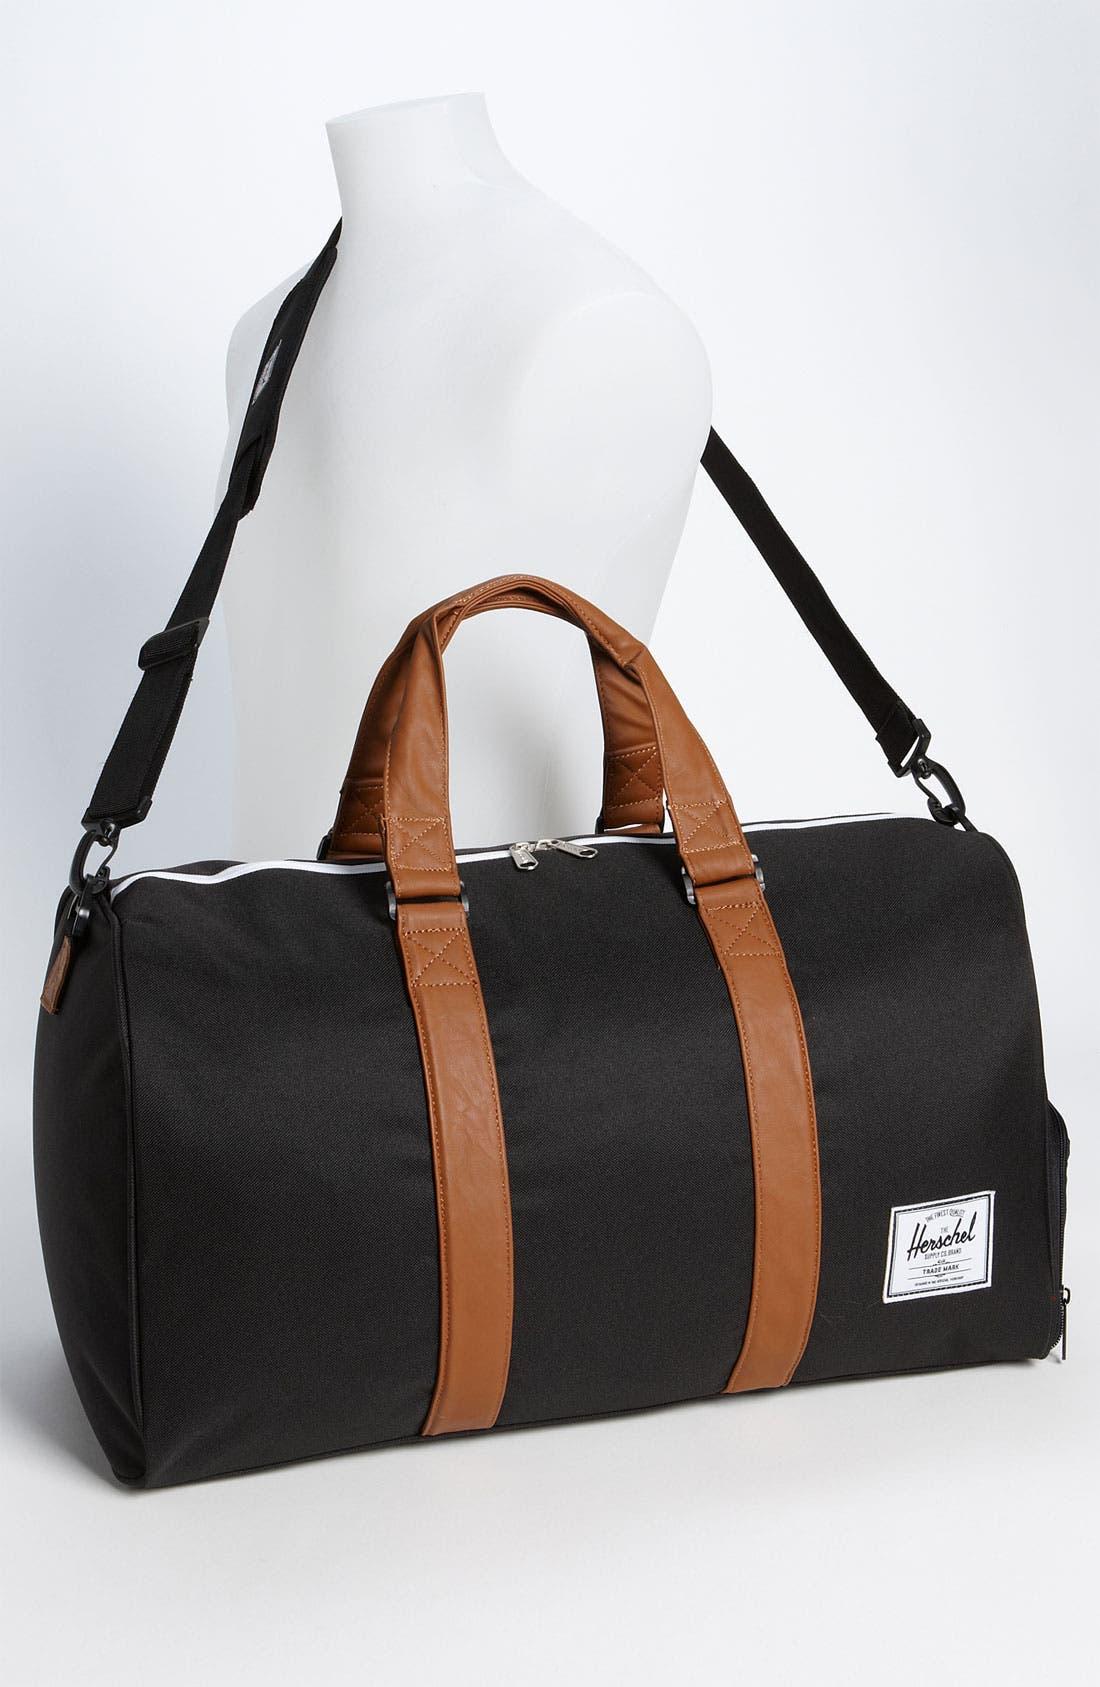 'Novel' Duffel Bag,                             Alternate thumbnail 10, color,                             BLACK/ TAN